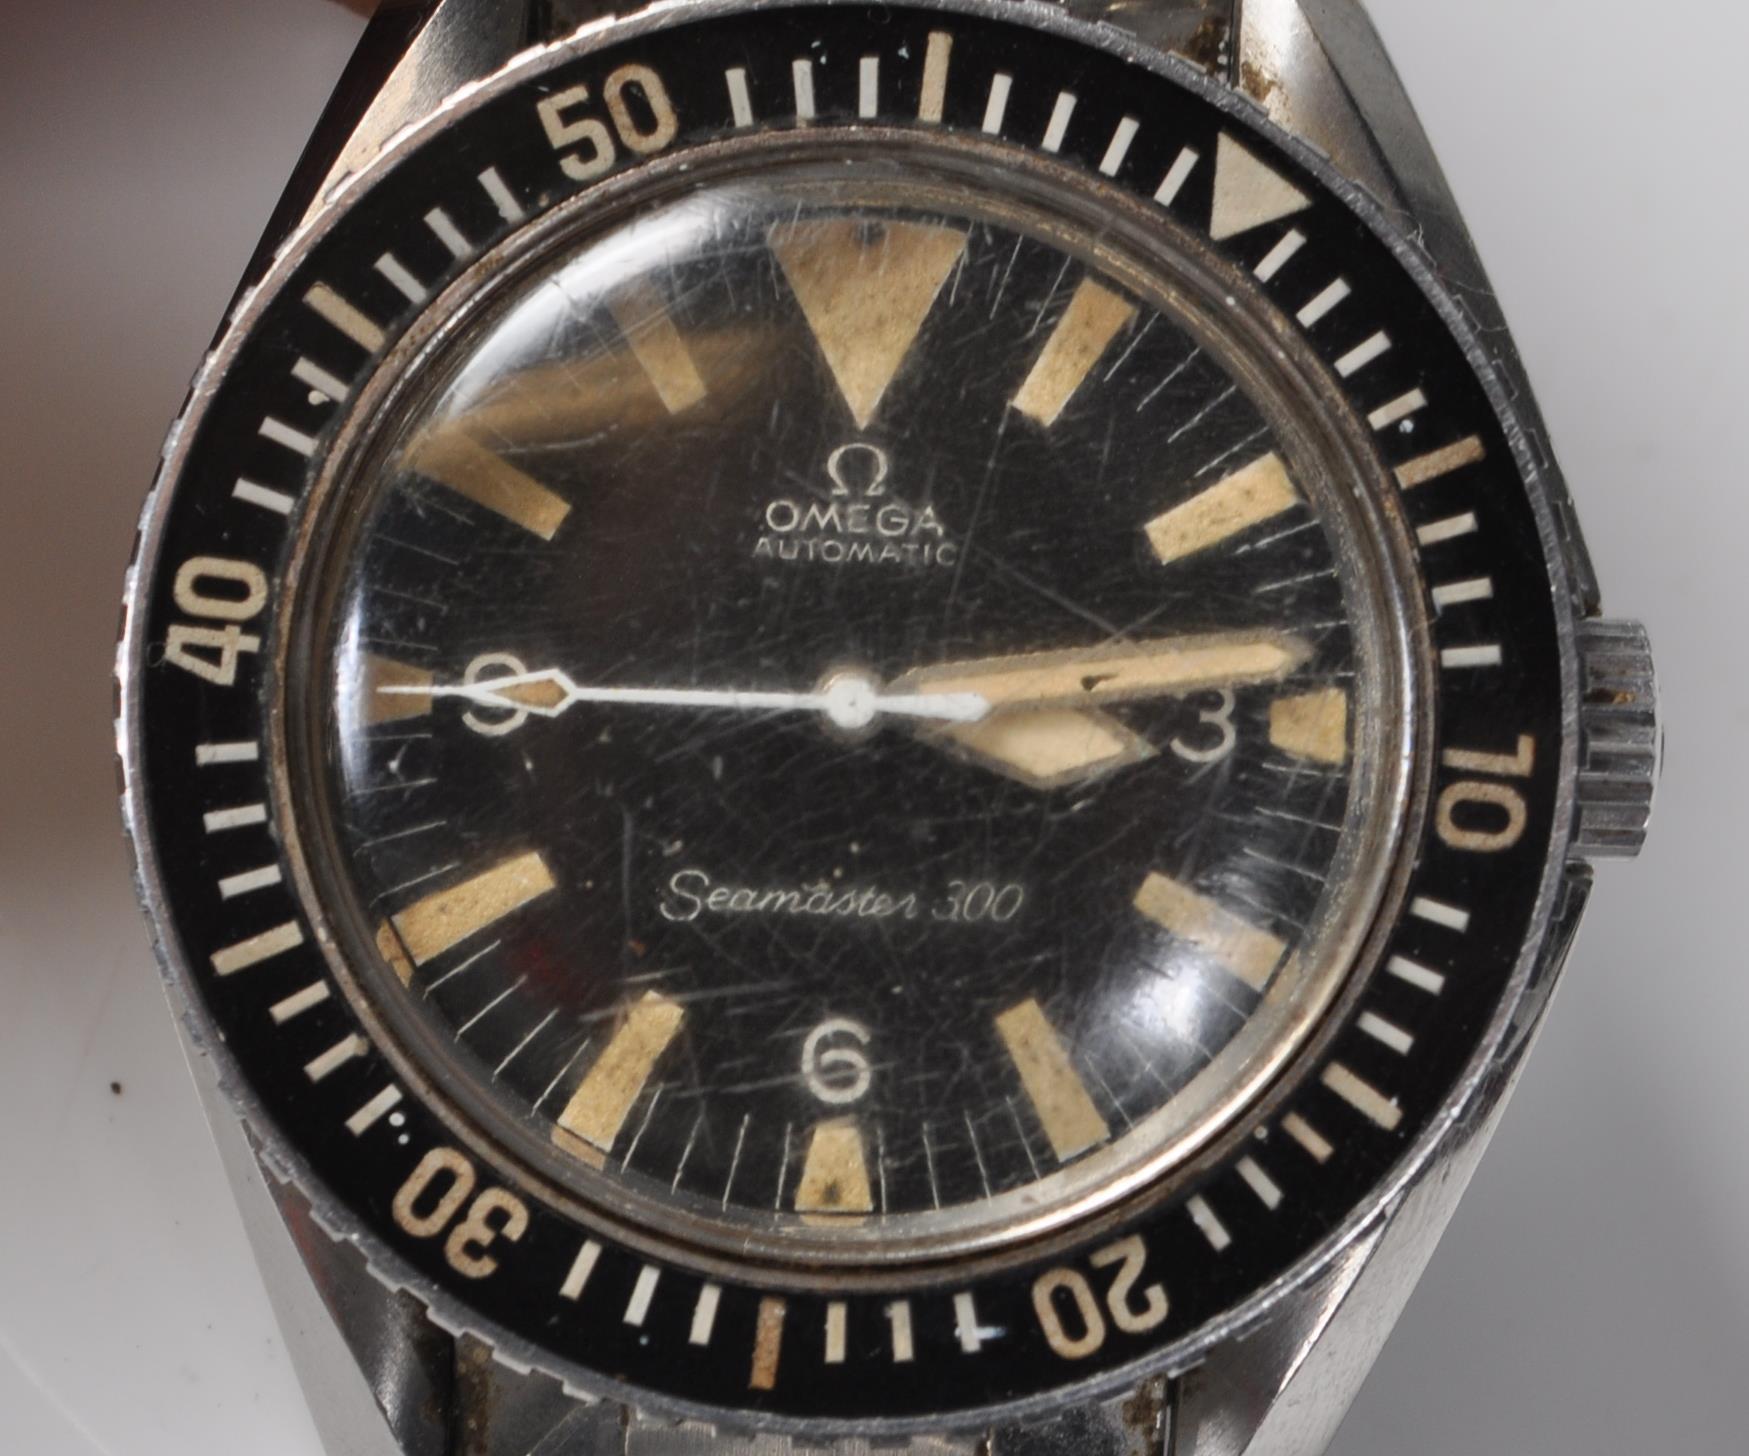 VINTAGE 1960'S OMEGA SEAMASTER 300 BIG TRIANGLE WRIST WATCH - Image 3 of 14